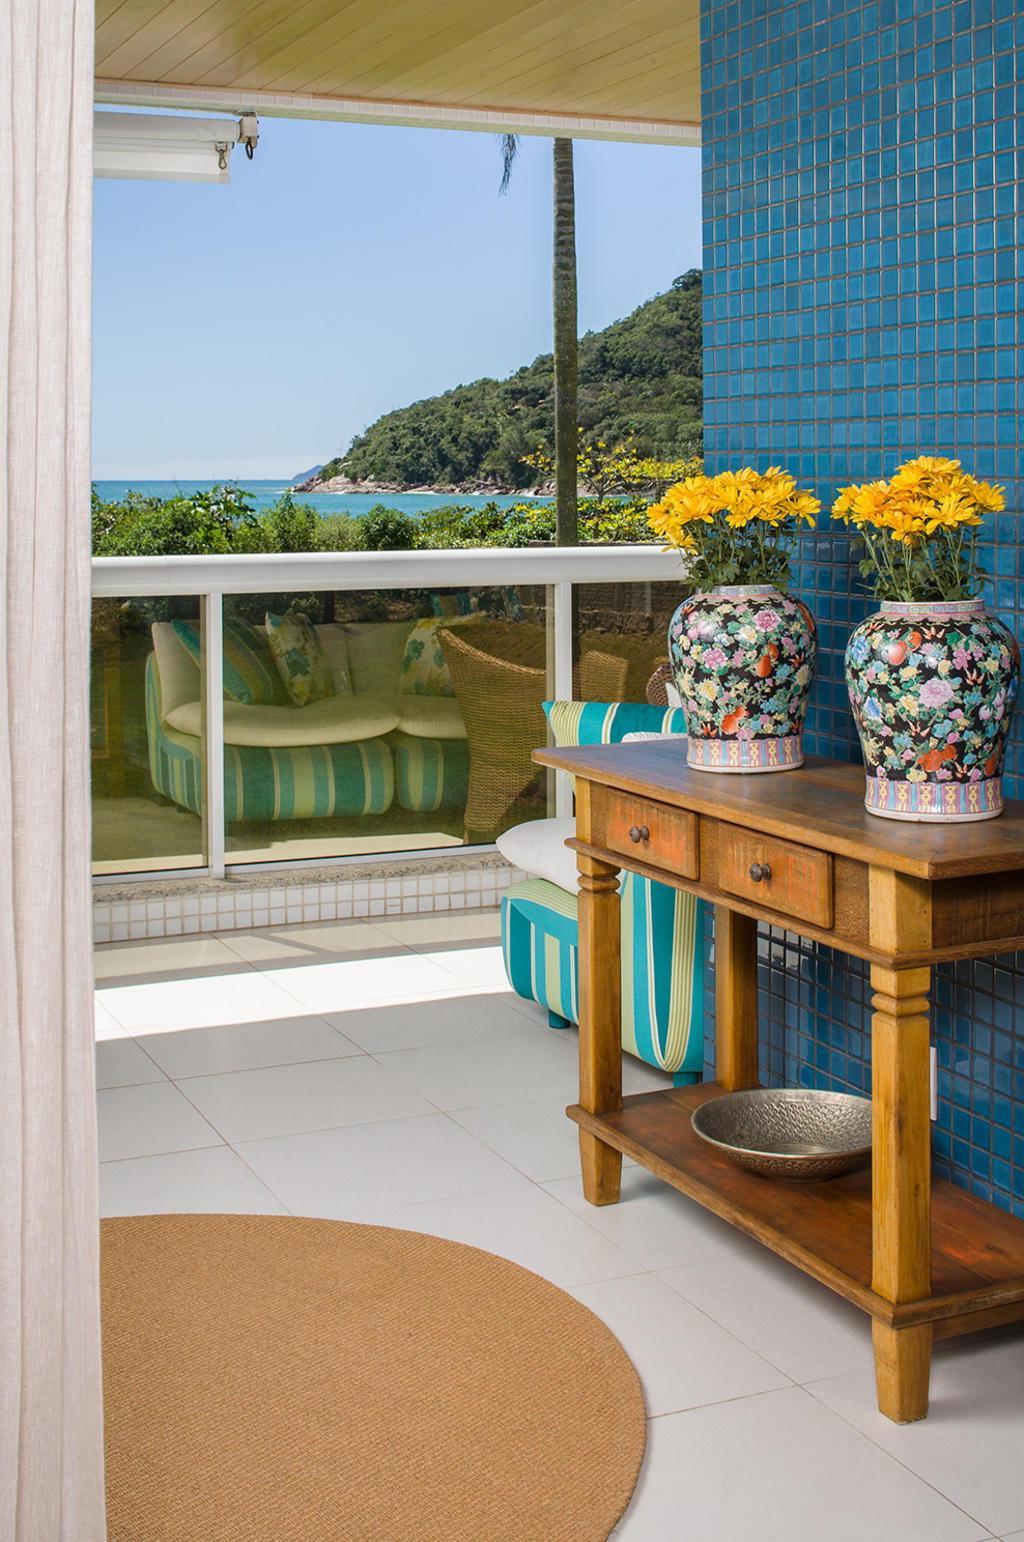 decoracao de apartamentos pequenos na praia : decoracao de apartamentos pequenos na praia:Apartamento na praia foge do tradicional – Diário Catarinense